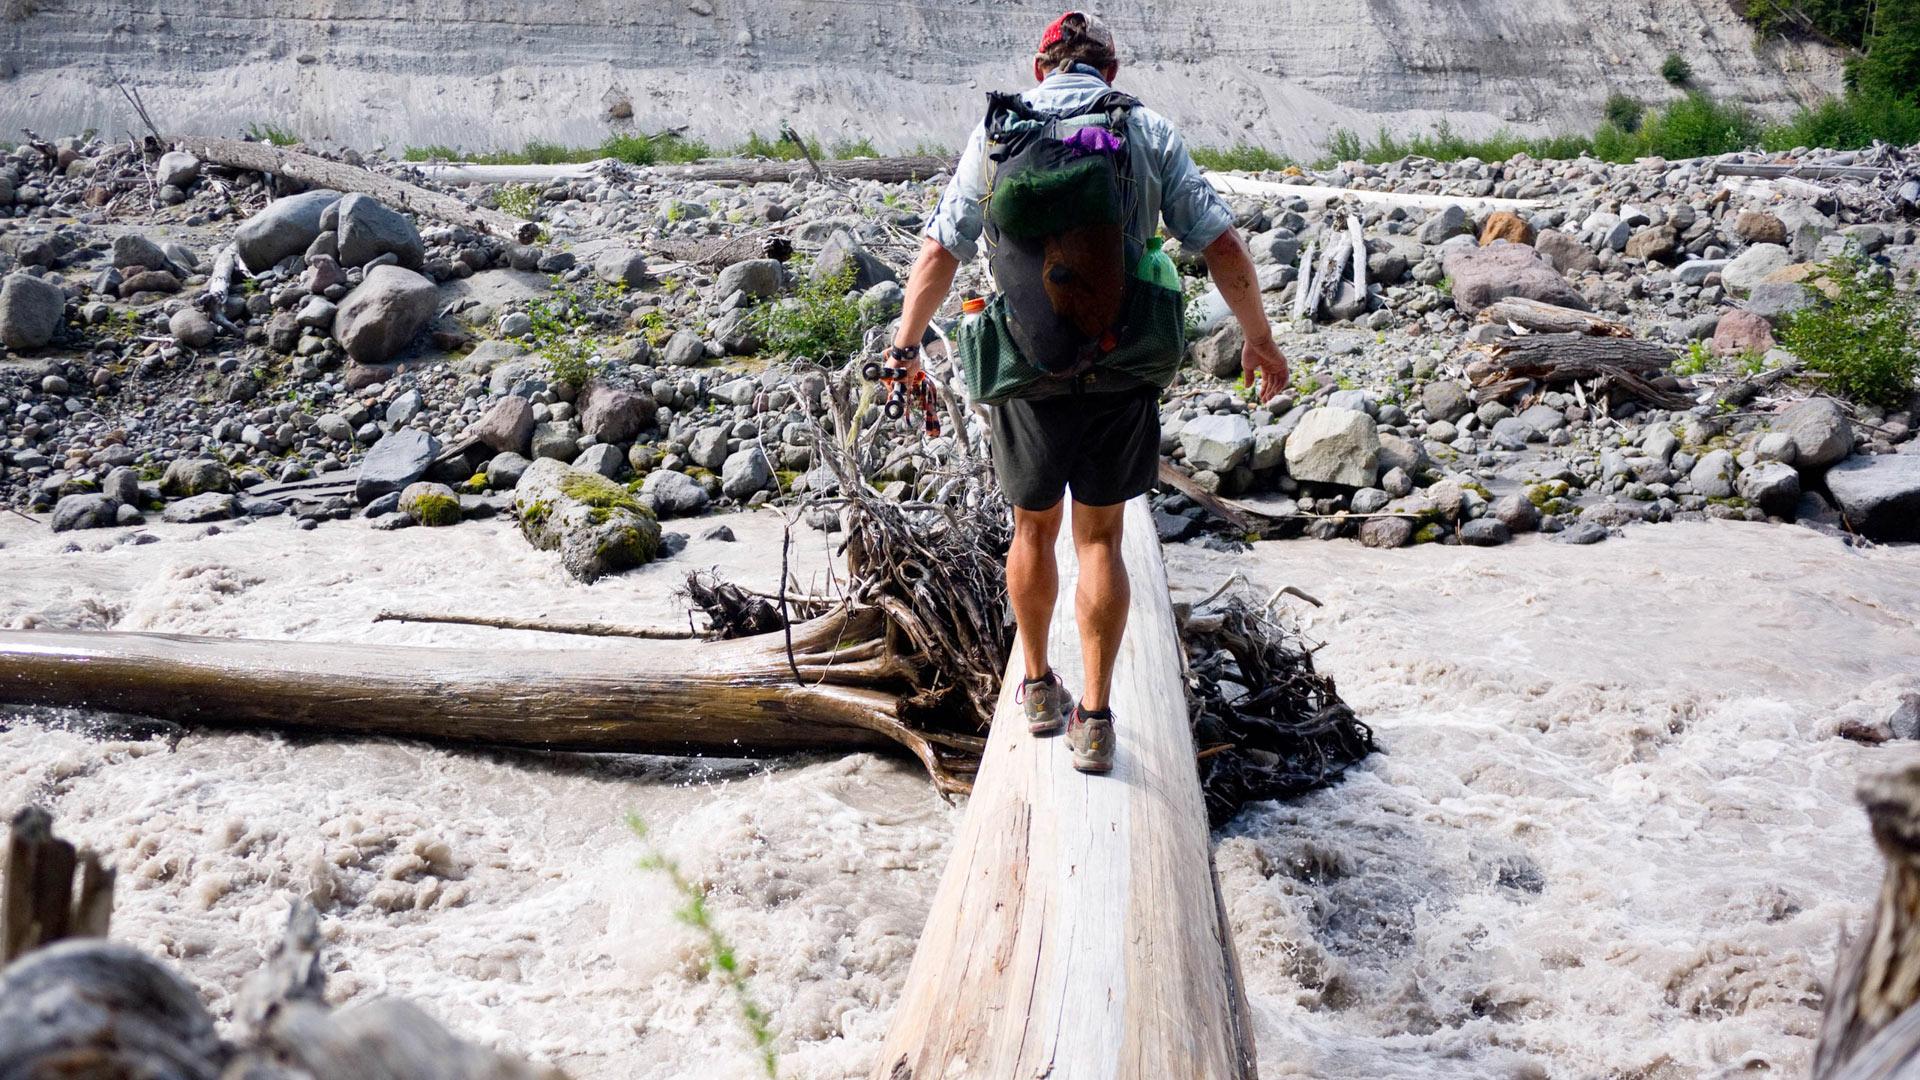 Crossing a creek on a log.